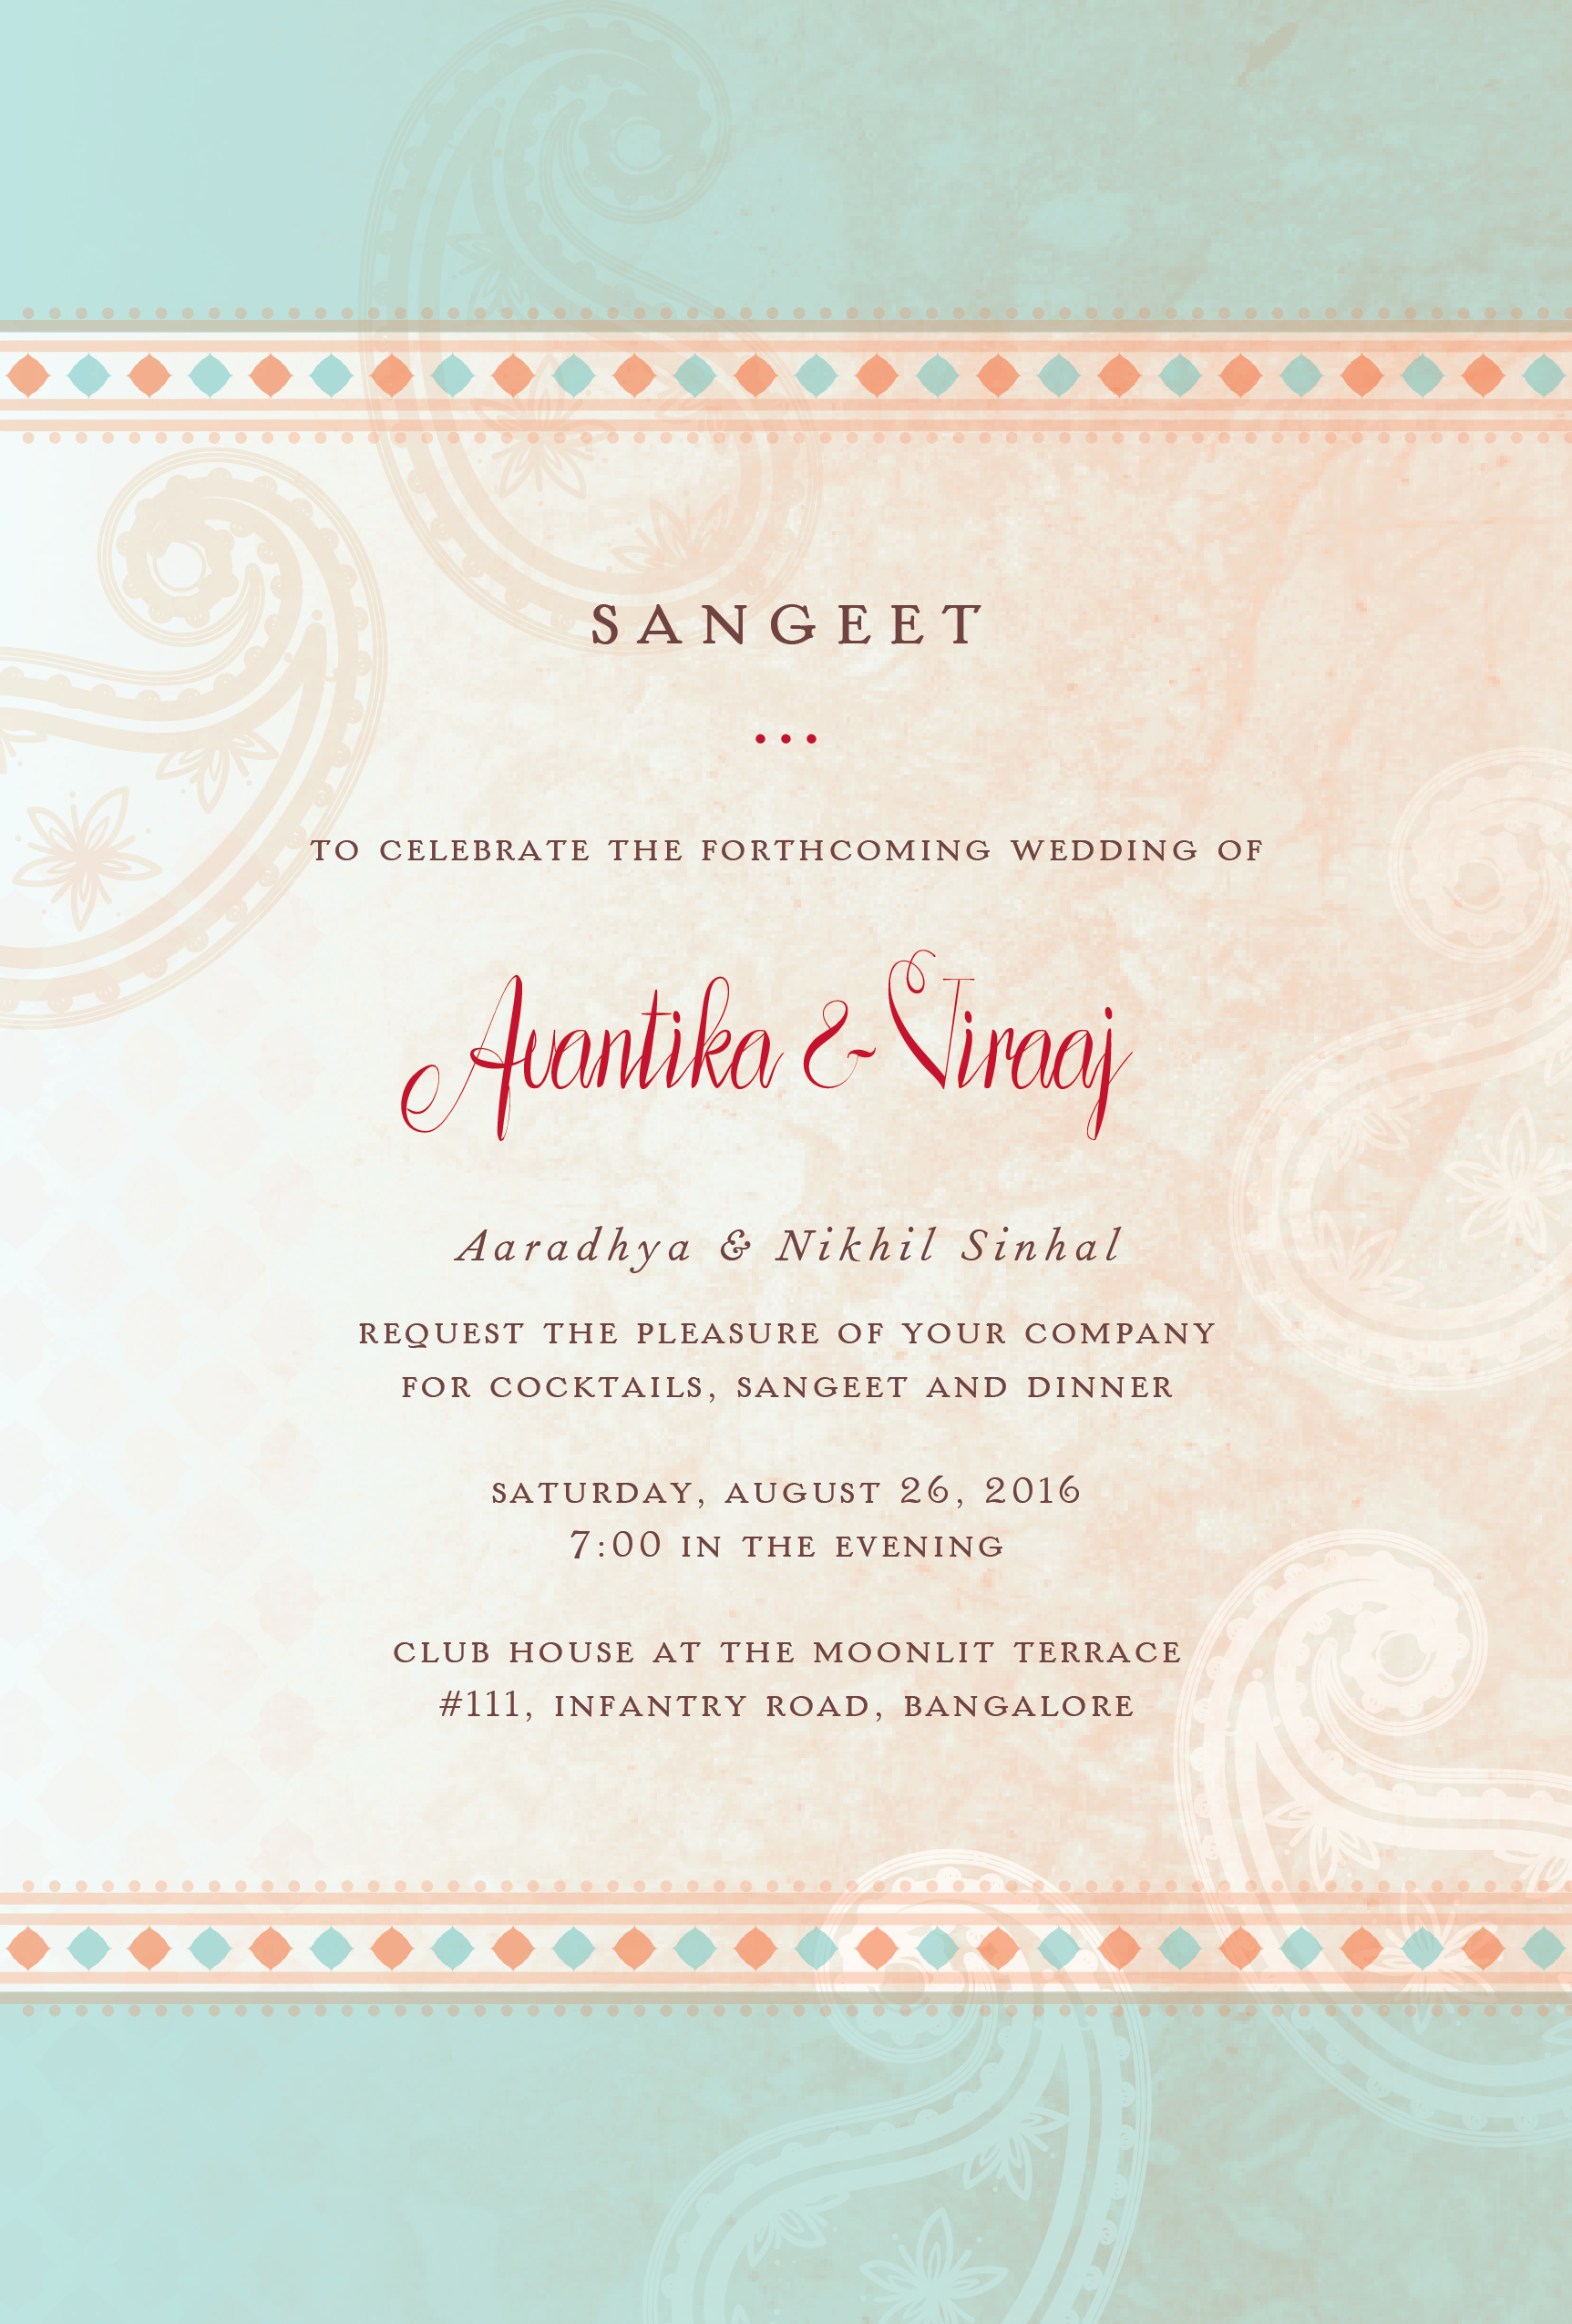 Birthday Invitation Cards Wedding Invitations Arangetram Invitation Indian Wedding Invitation Cards Wedding Invitation Card Design Wedding Invitation Cards